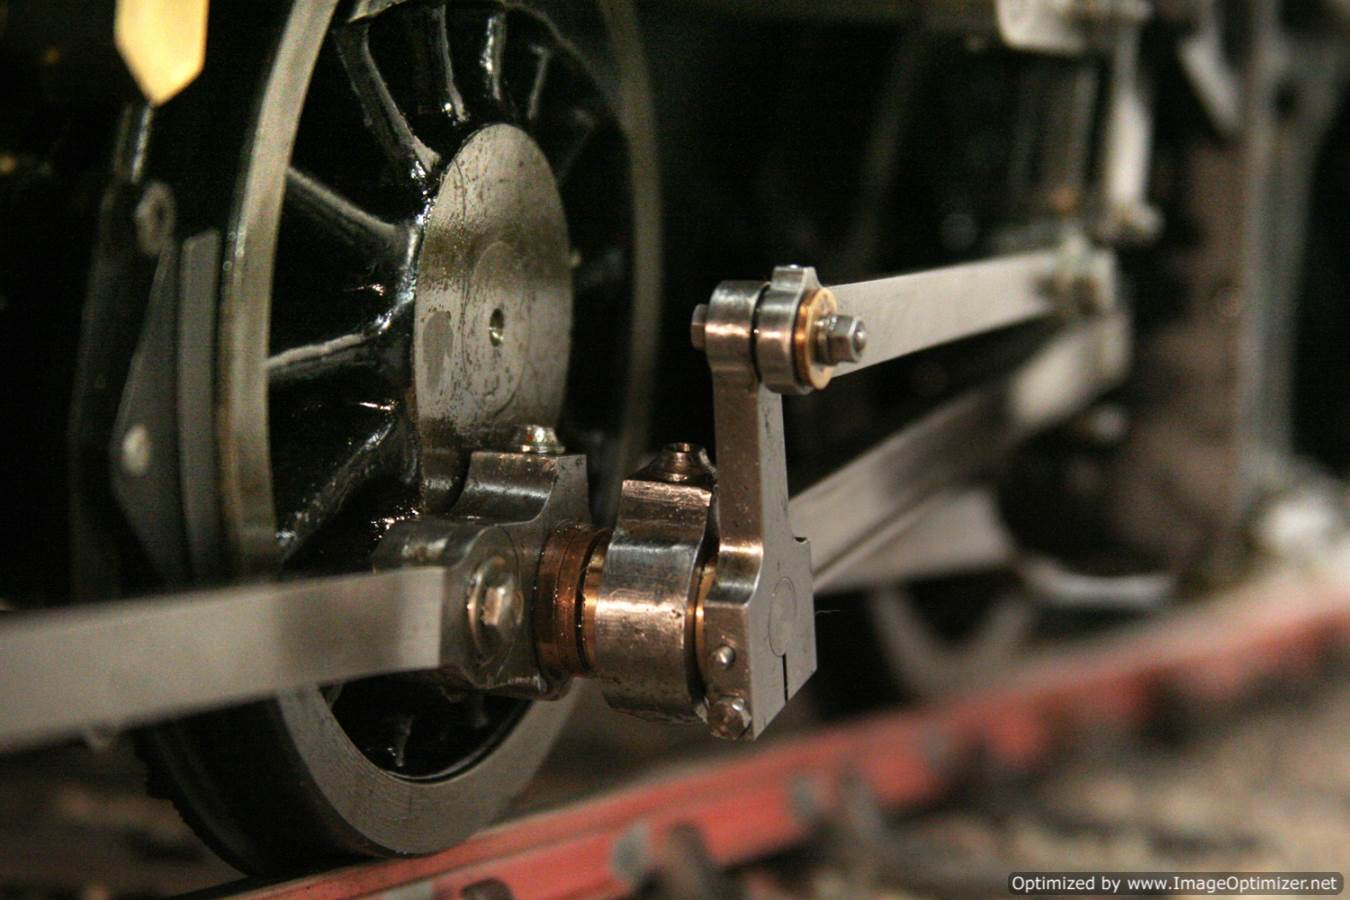 test simplex live steam locomotive for sale 16 Optimized